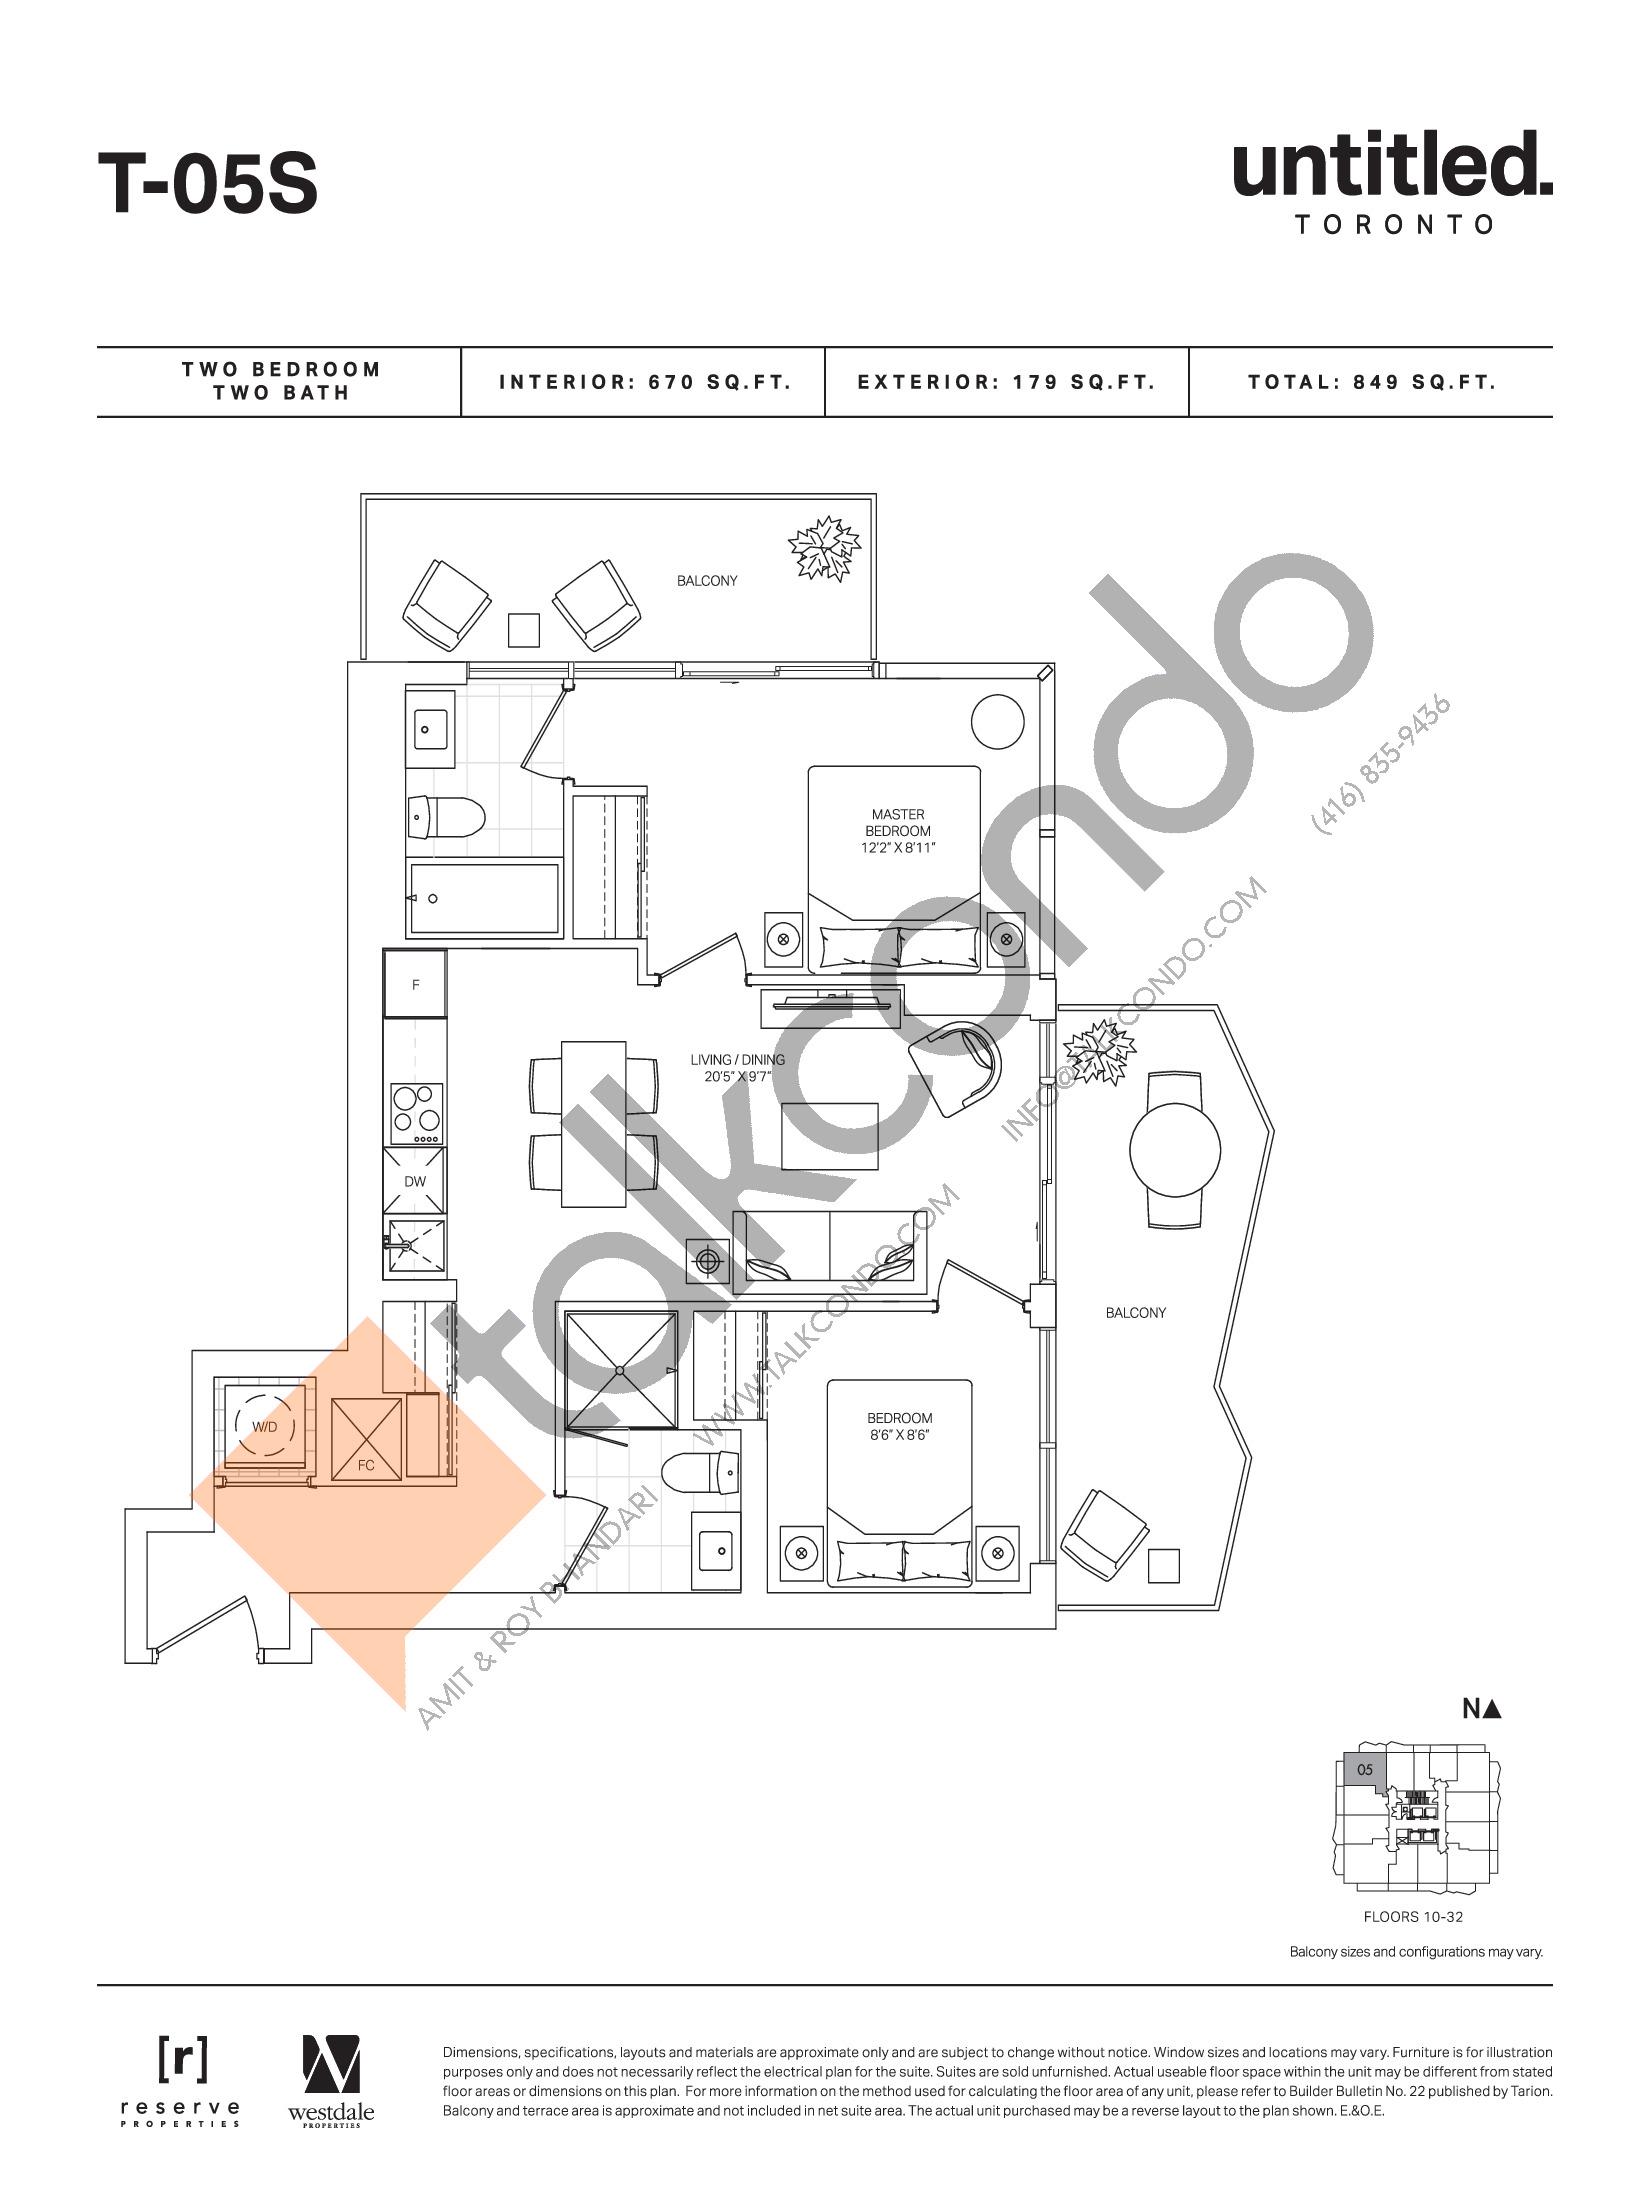 T-05S Floor Plan at Untitled Toronto Condos - 670 sq.ft